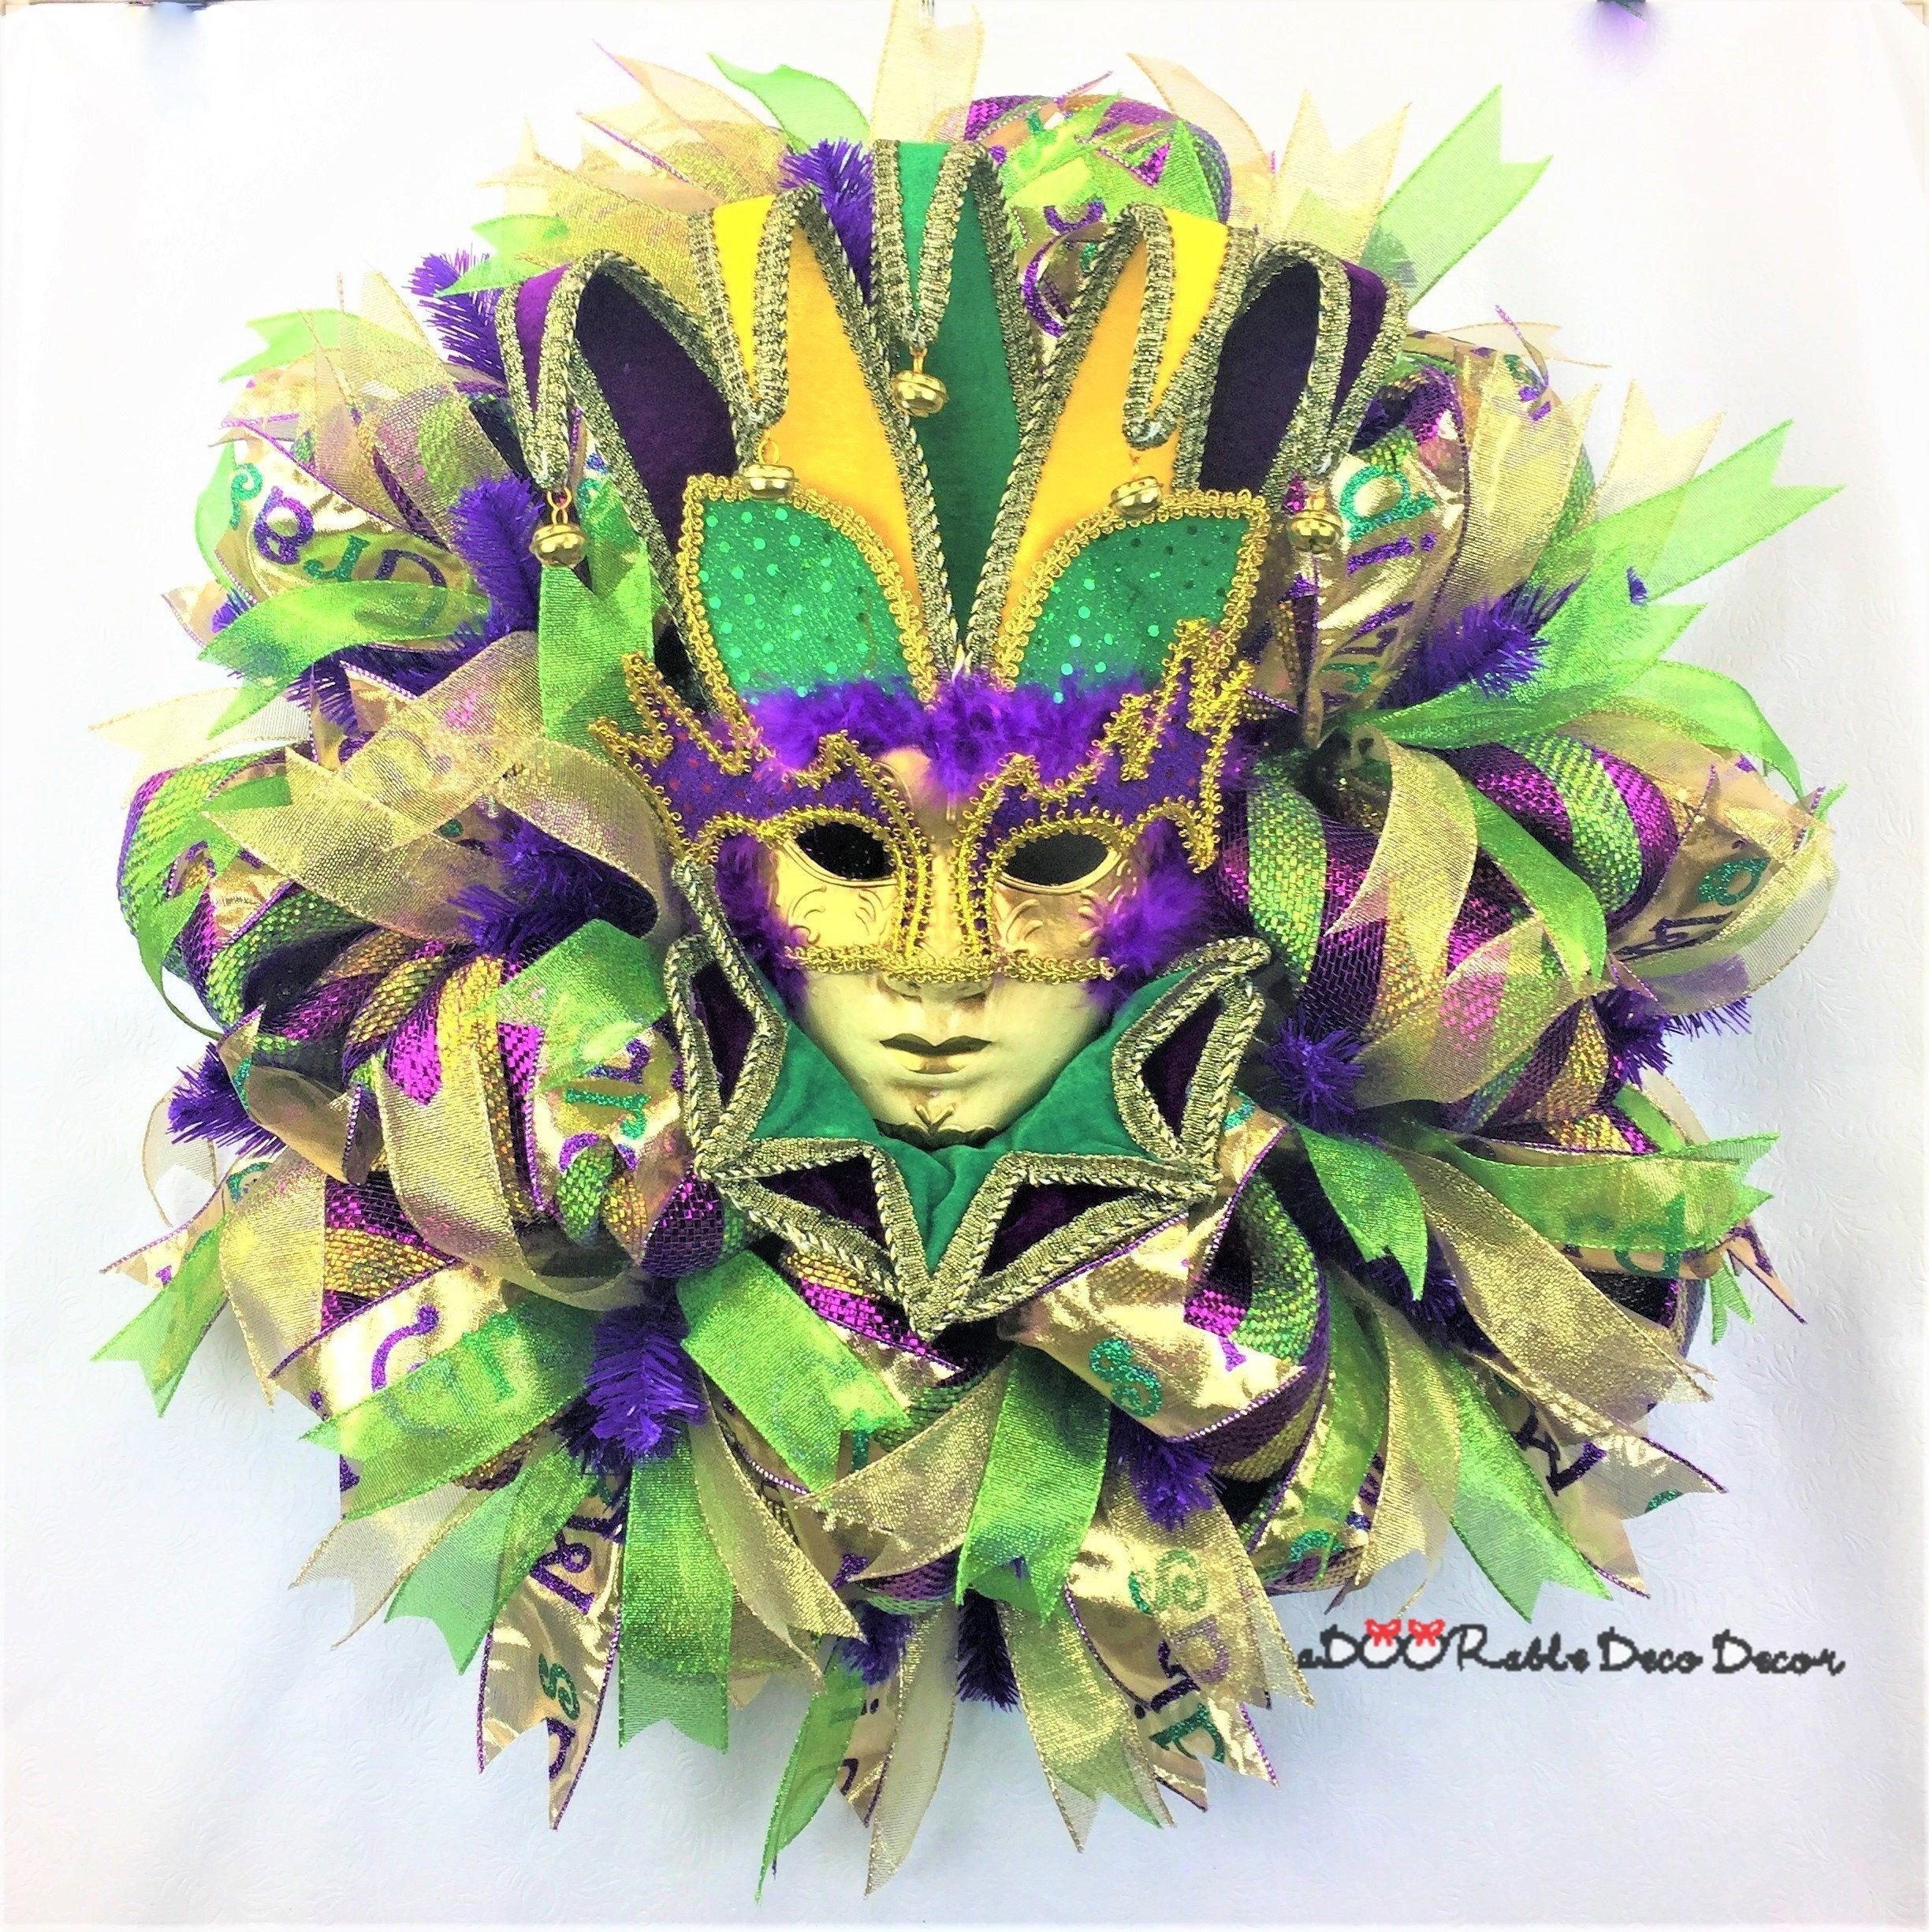 Mardi Gras Mask Decorating Ideas Mardi Gras Wreath Mardi Gras Deco Mesh Fat Tuesday Mardi Gras & Mardi Gras Mask Decorating Ideas   Decorative Design